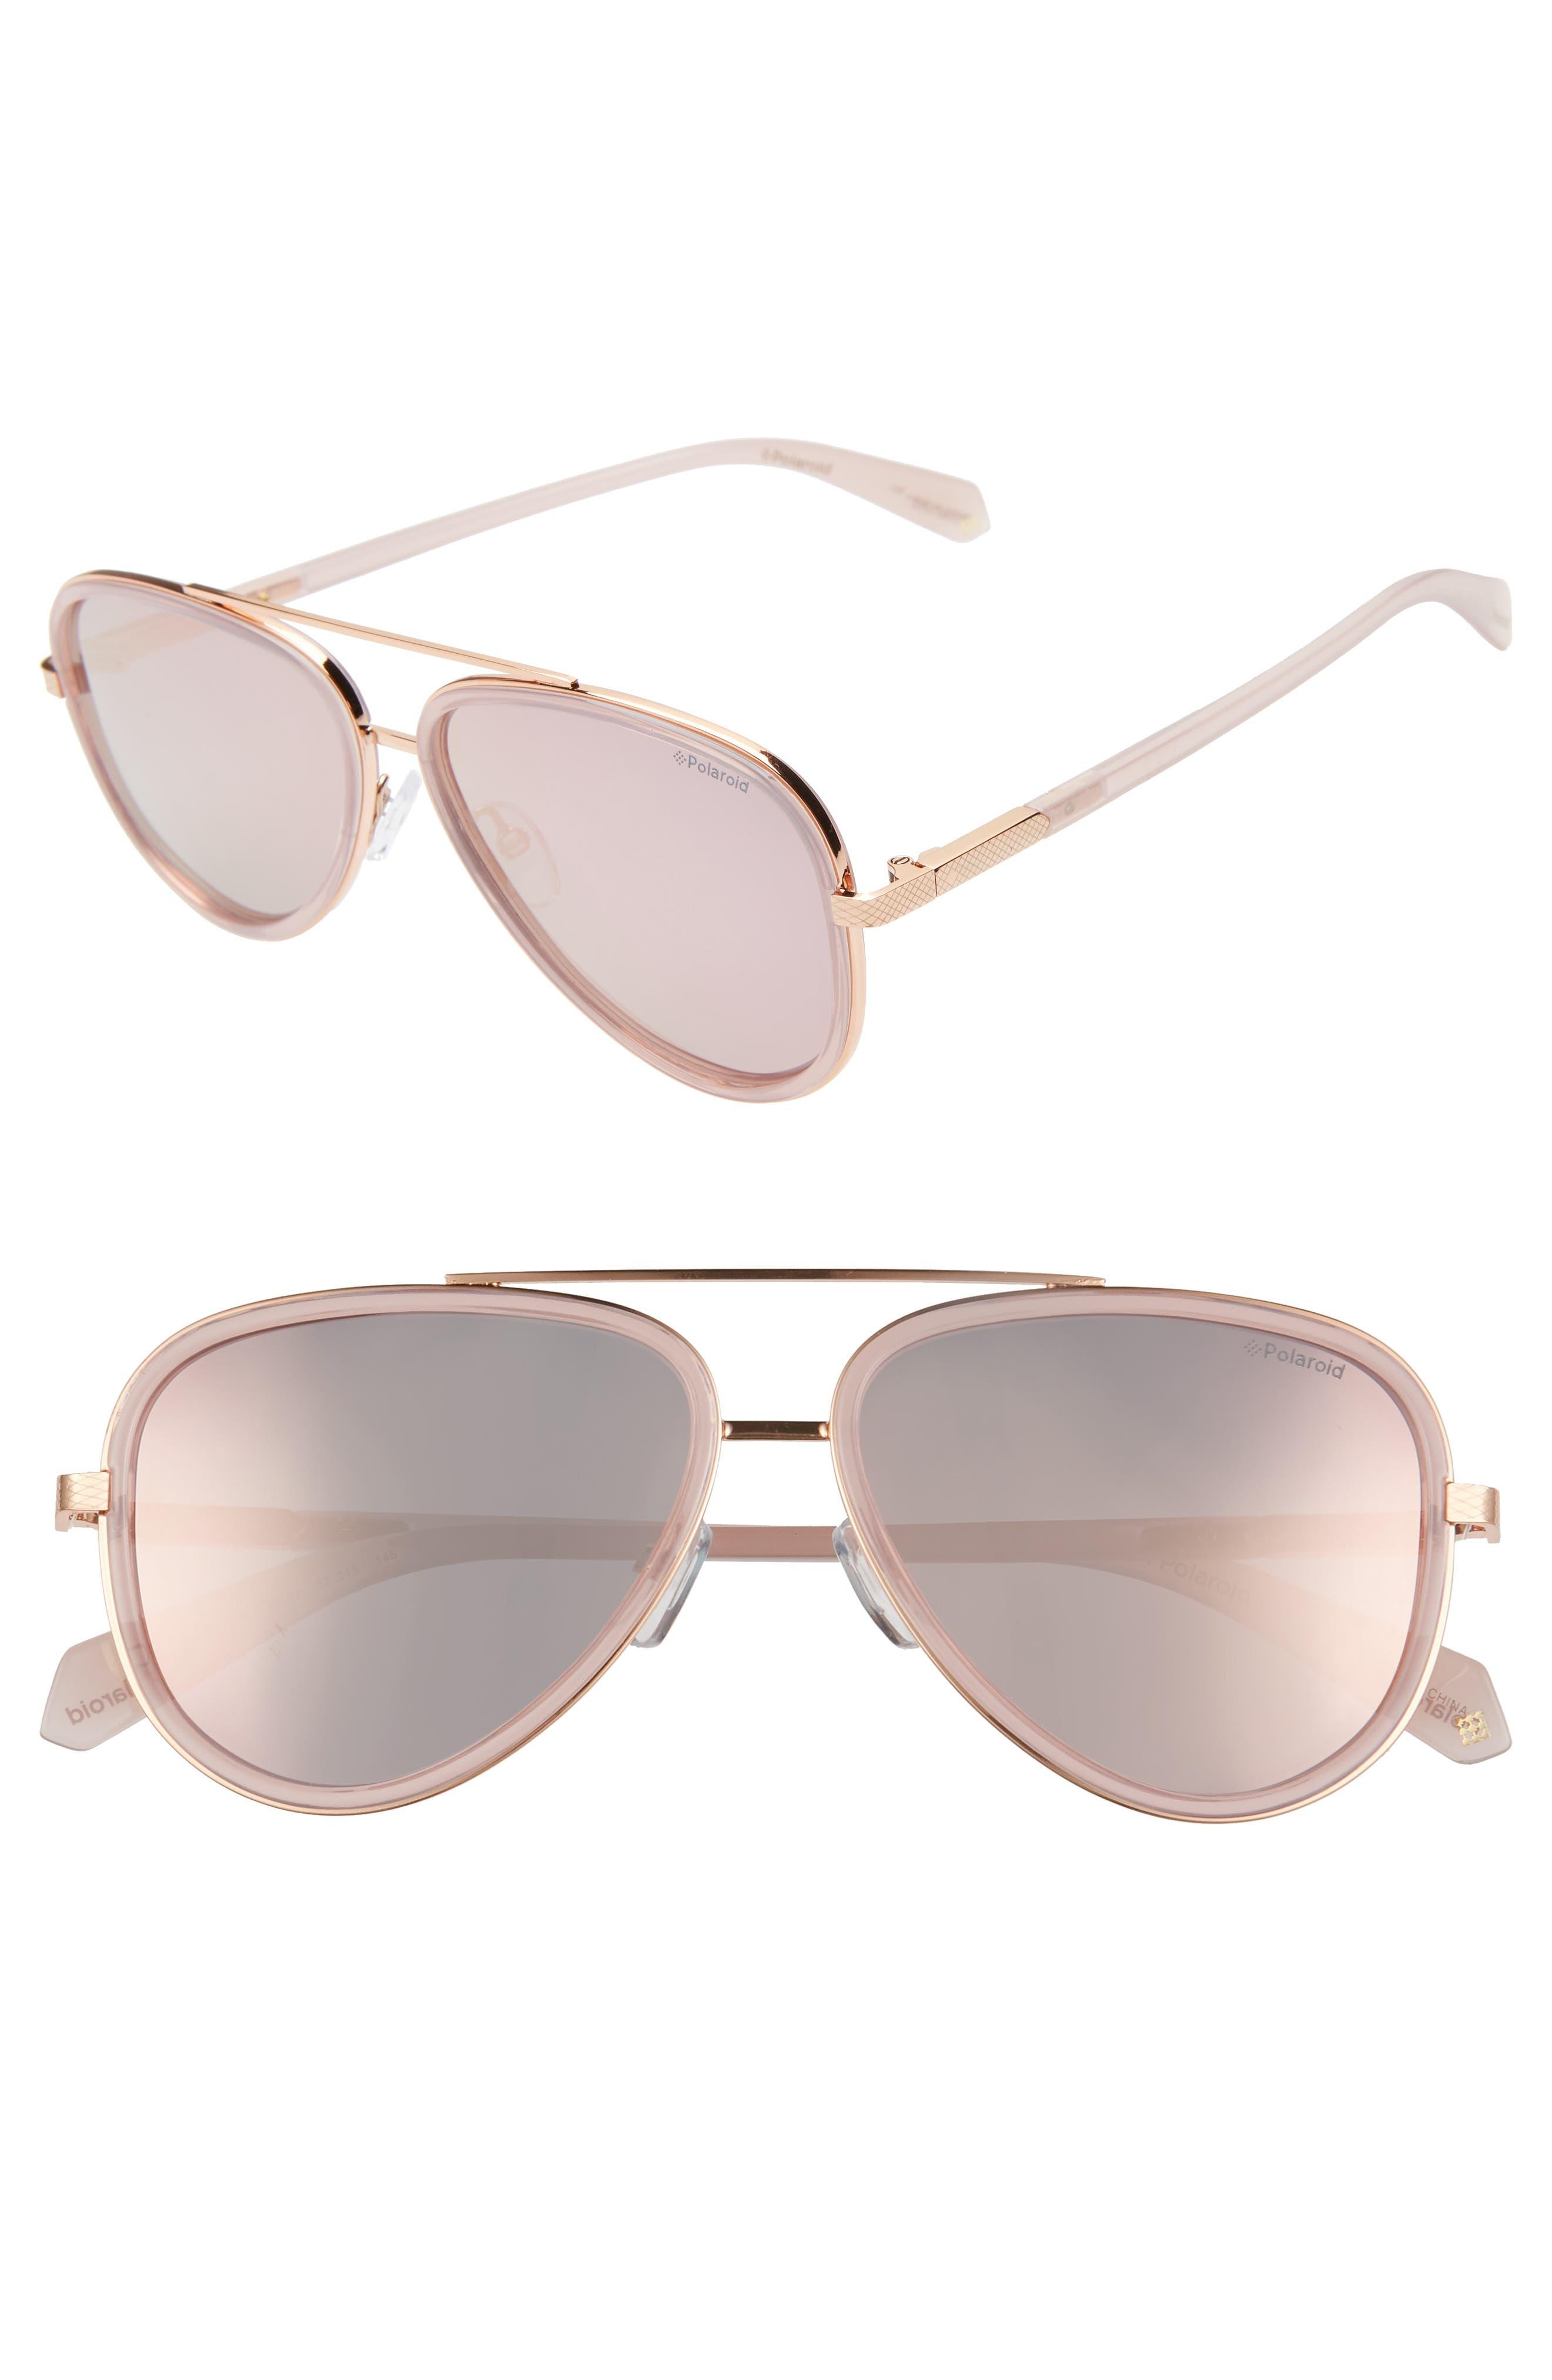 Polaroid 57Mm Polarized Aviator Sunglasses - Pink